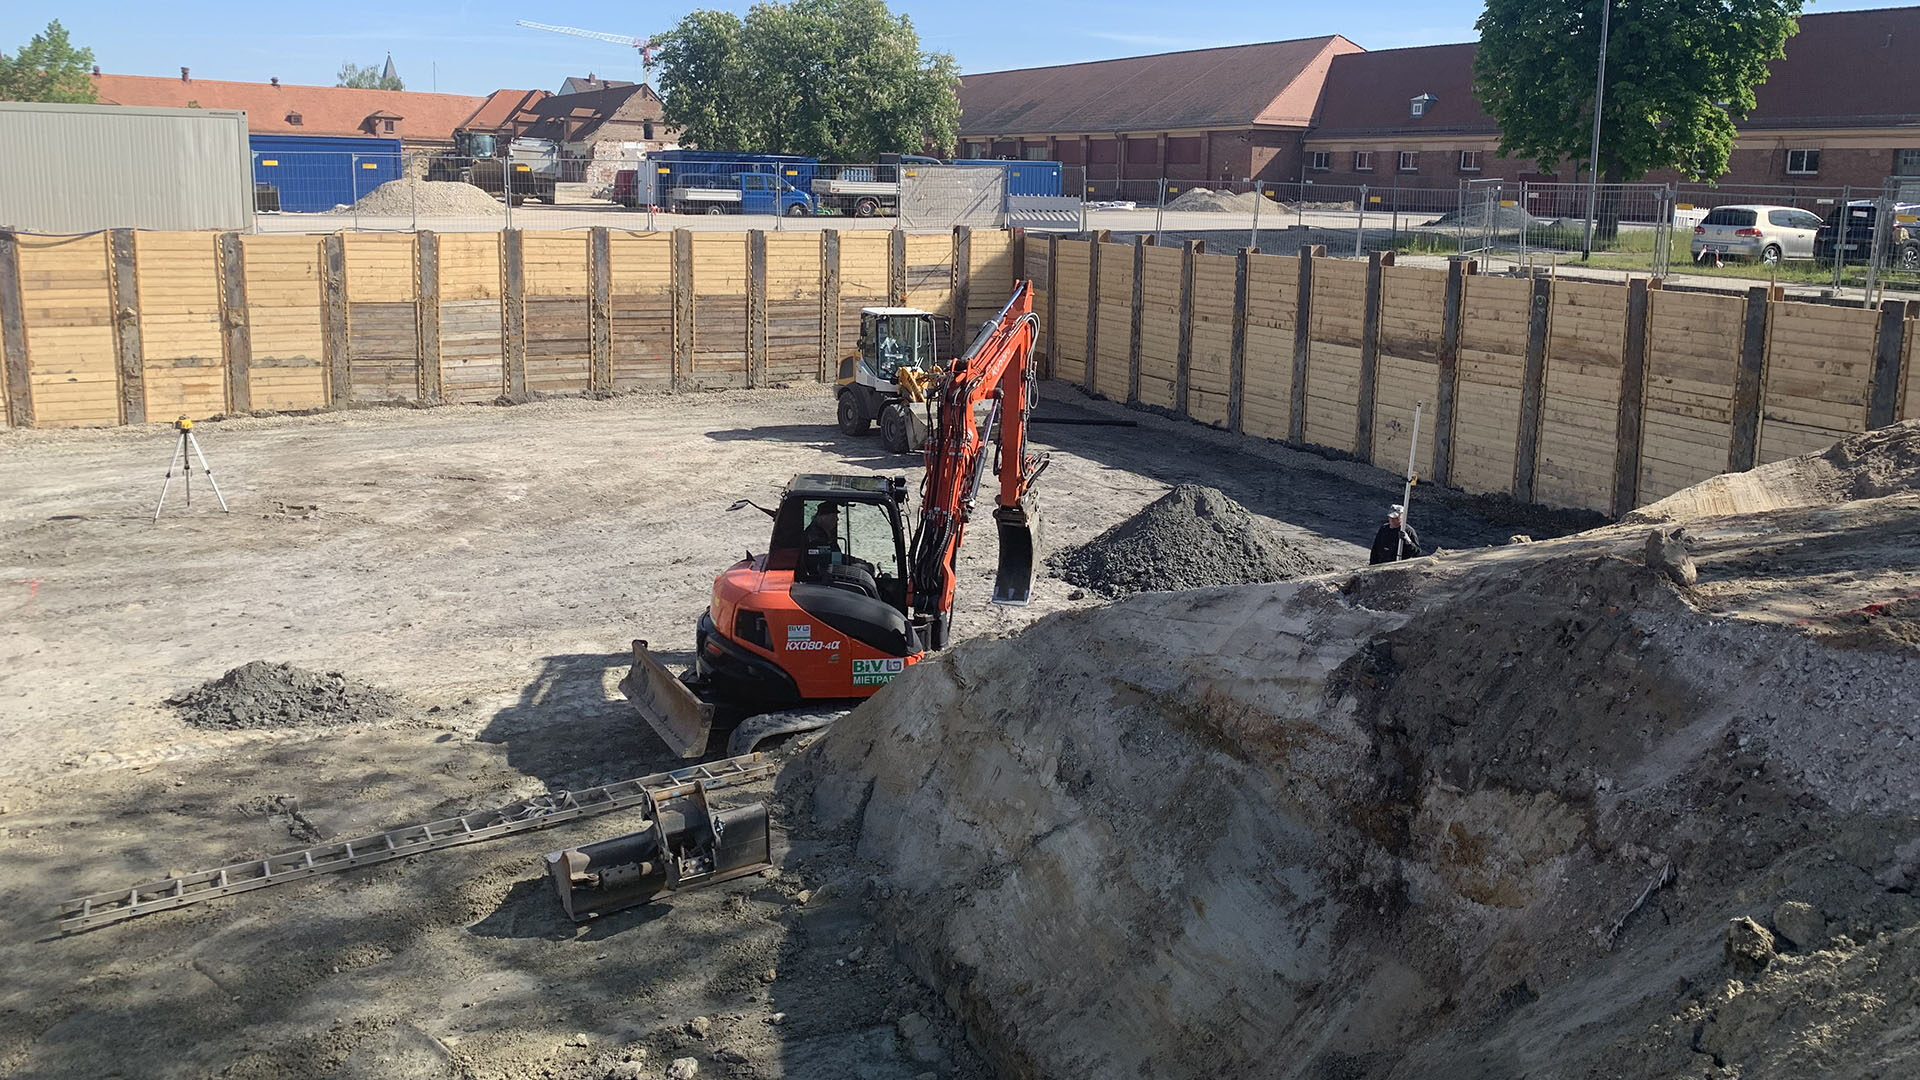 sauerzapfe-architekten-kulturquartier-lagarde-energiezentrale-bamberg